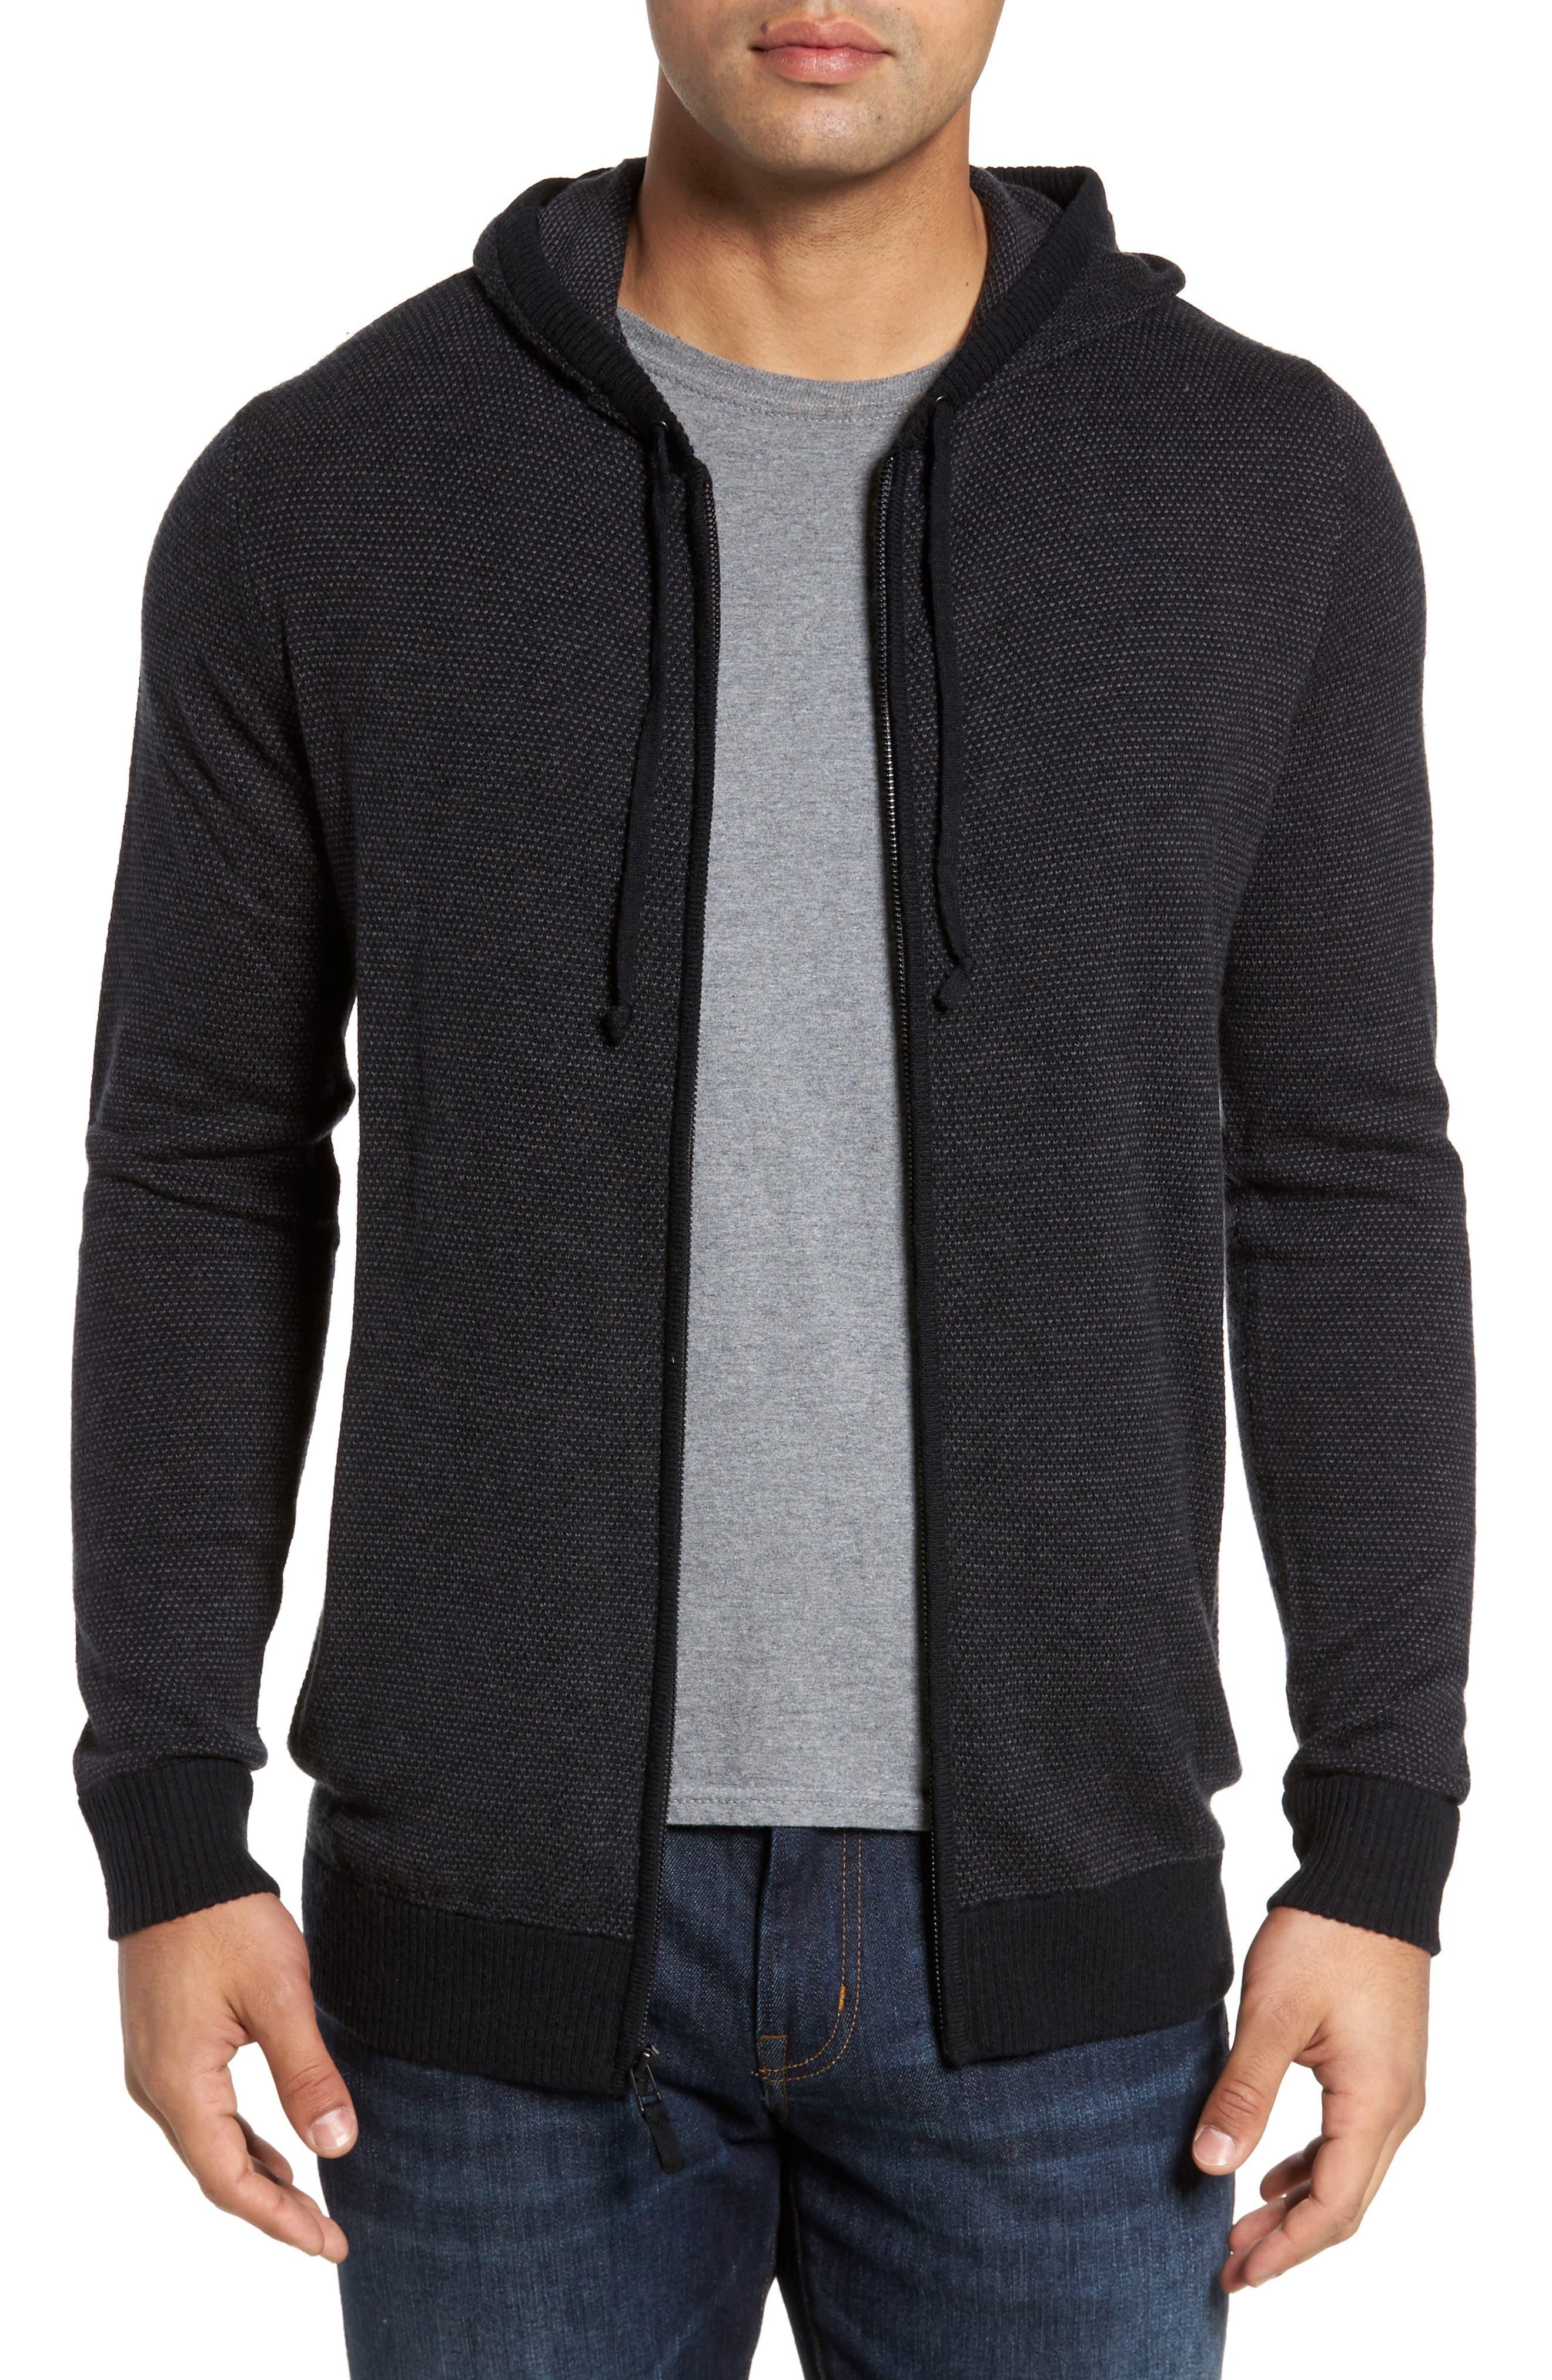 Travis Mathew Graydon Wool & Cashmere Zip Front Hoodie